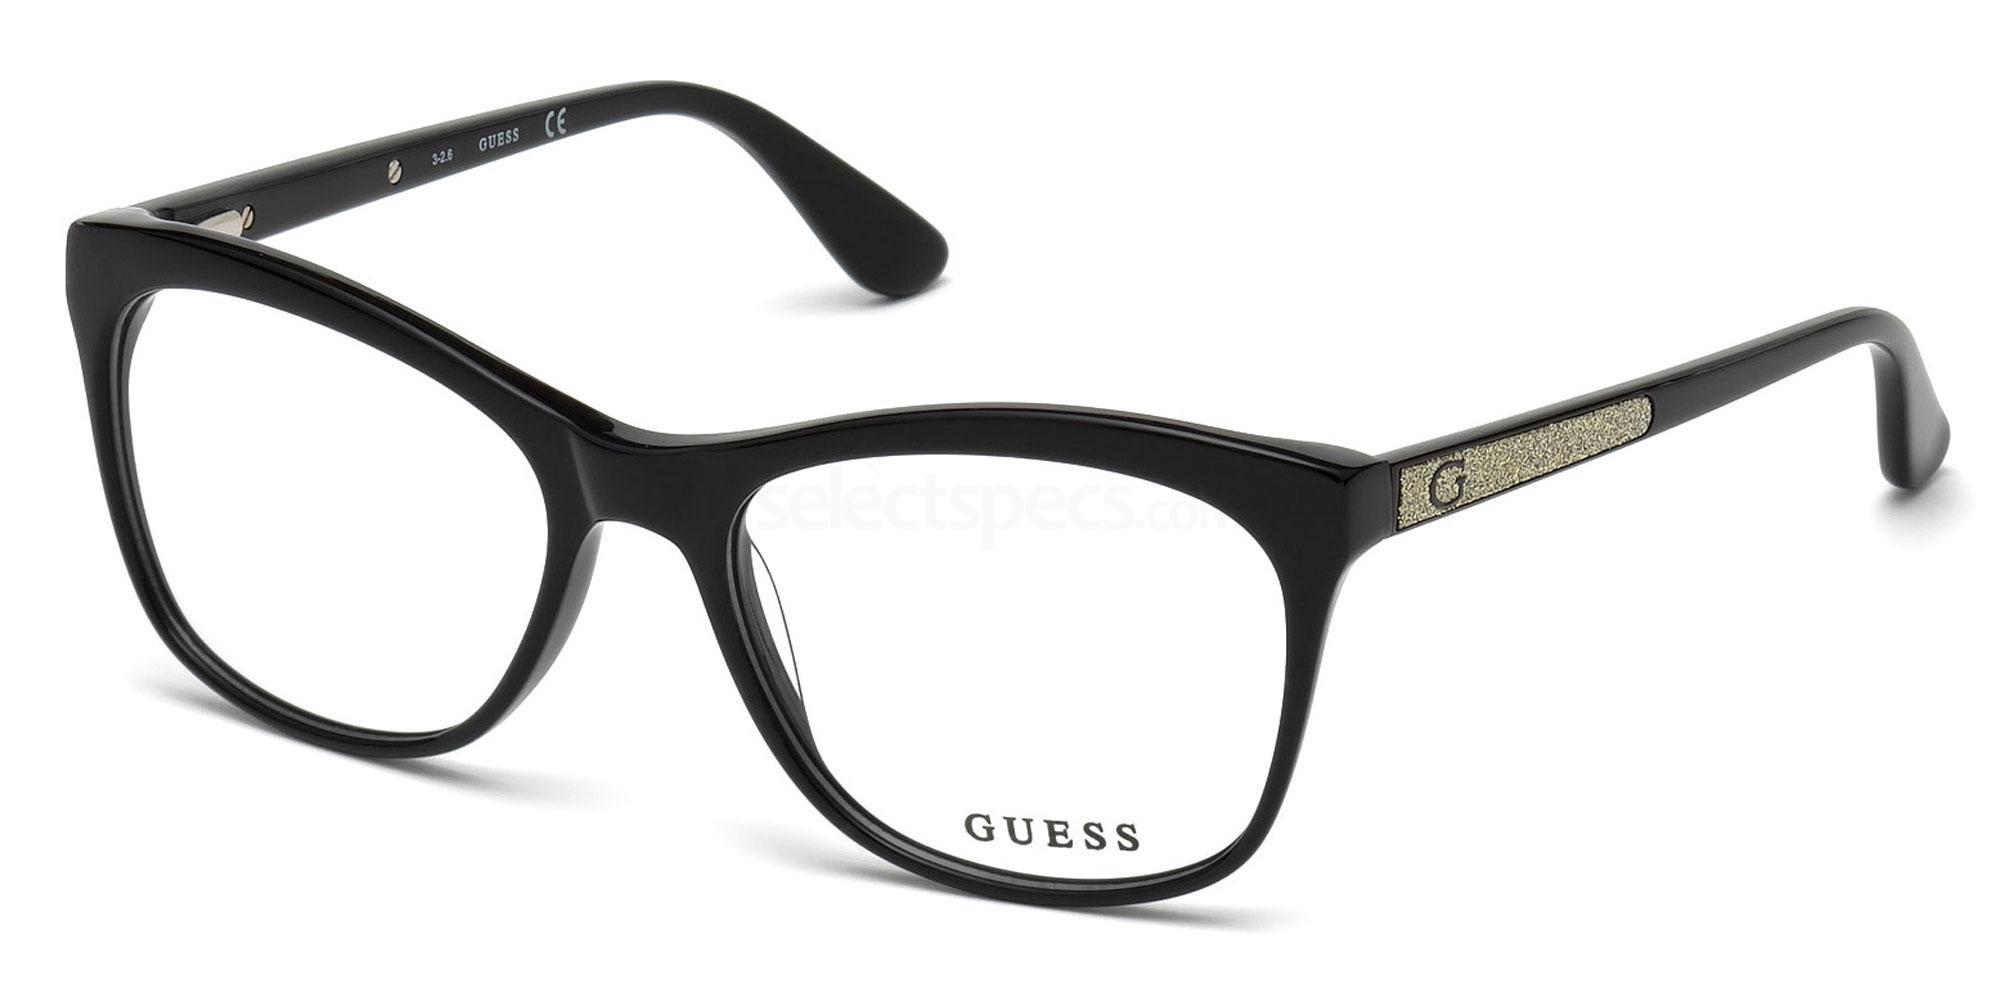 005 GU2619 Glasses, Guess